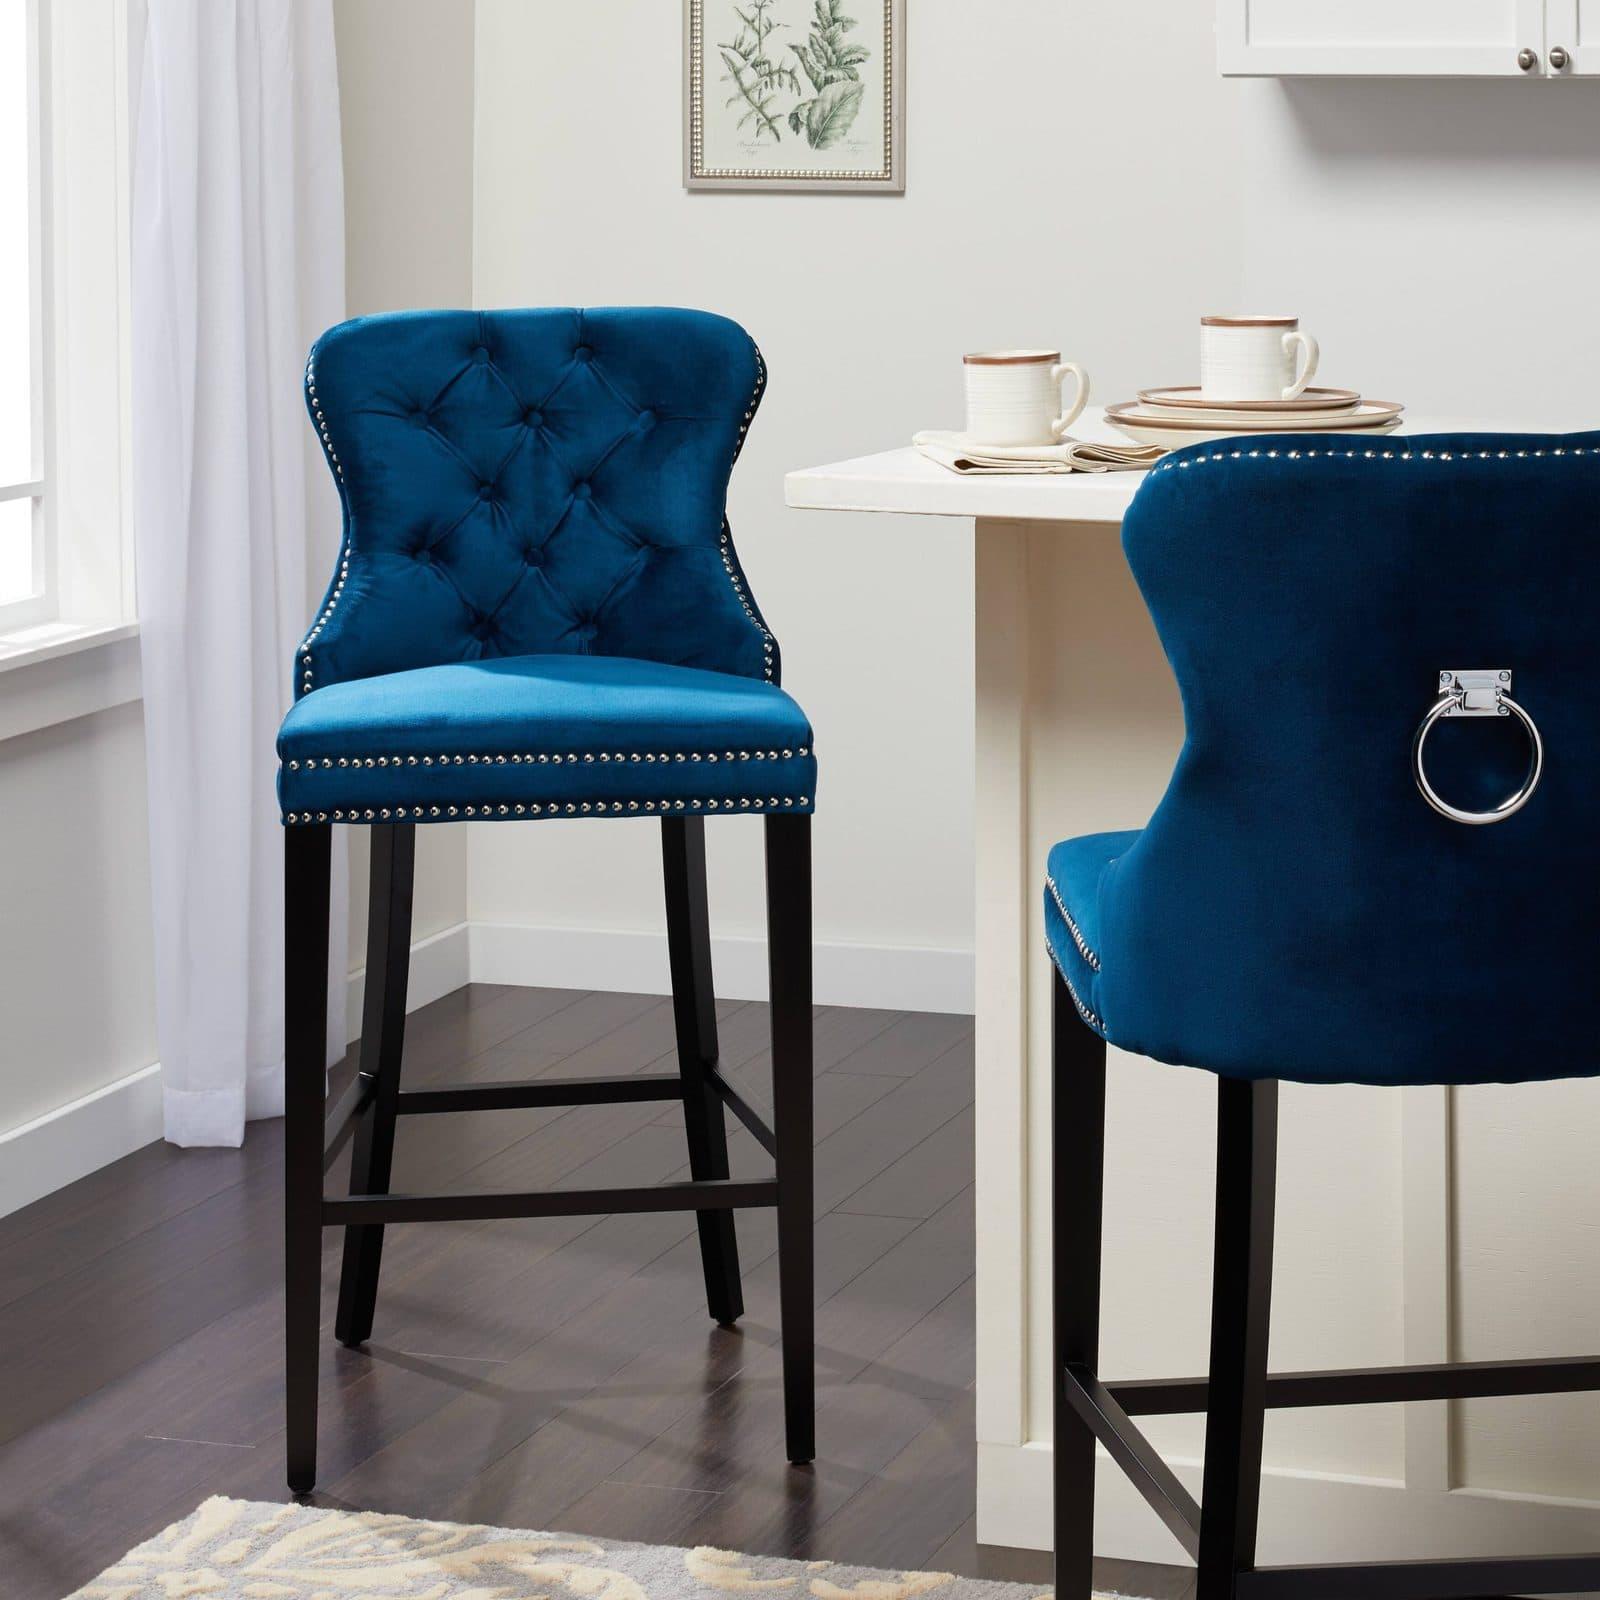 Glam Blue Velvet High Chairs for Kitchen Islands